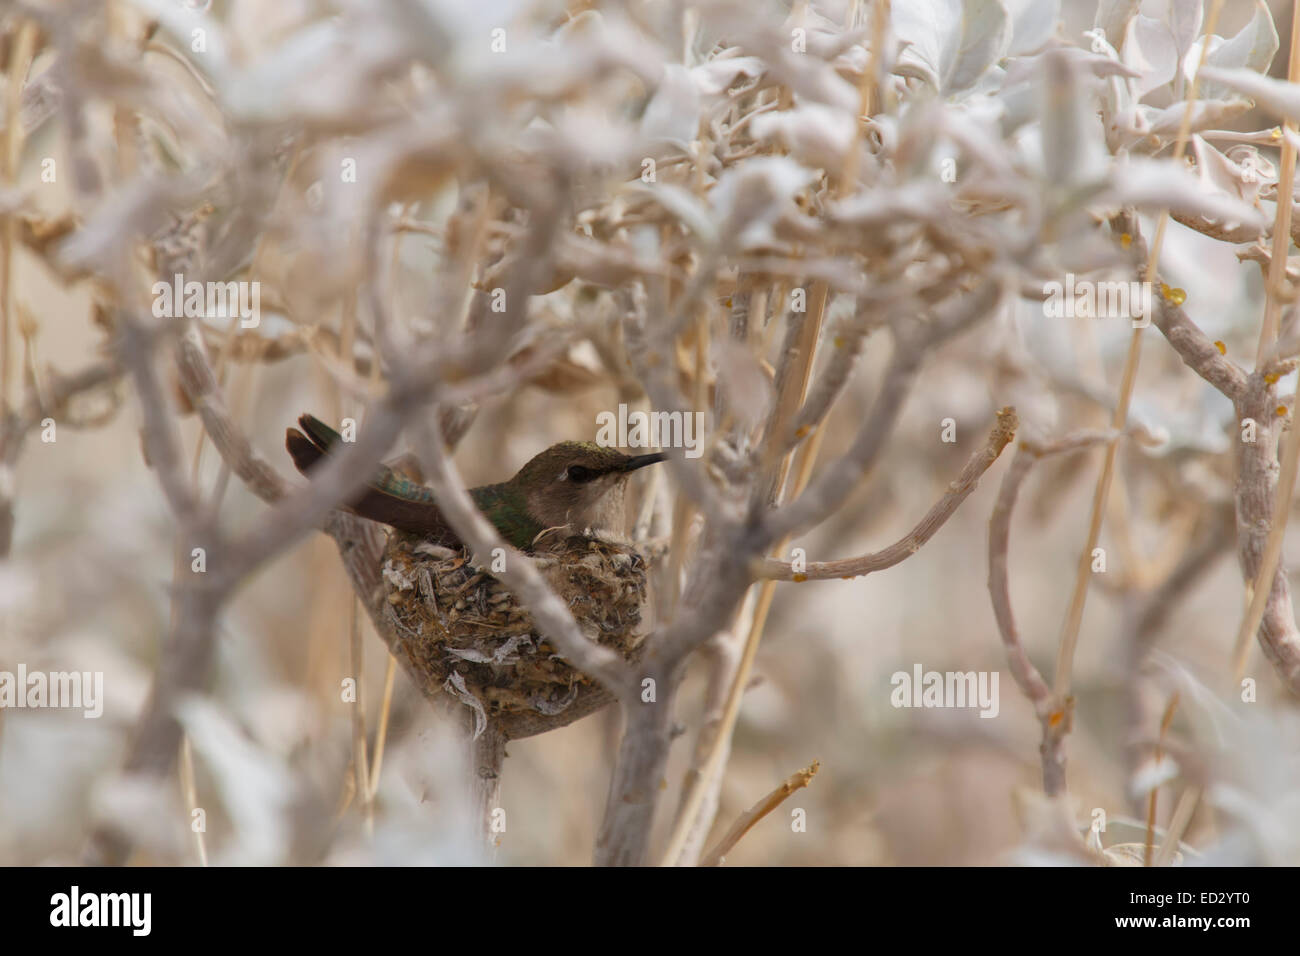 Hummingbird nest, Anza-Borrego Desert State Park, California. - Stock Image